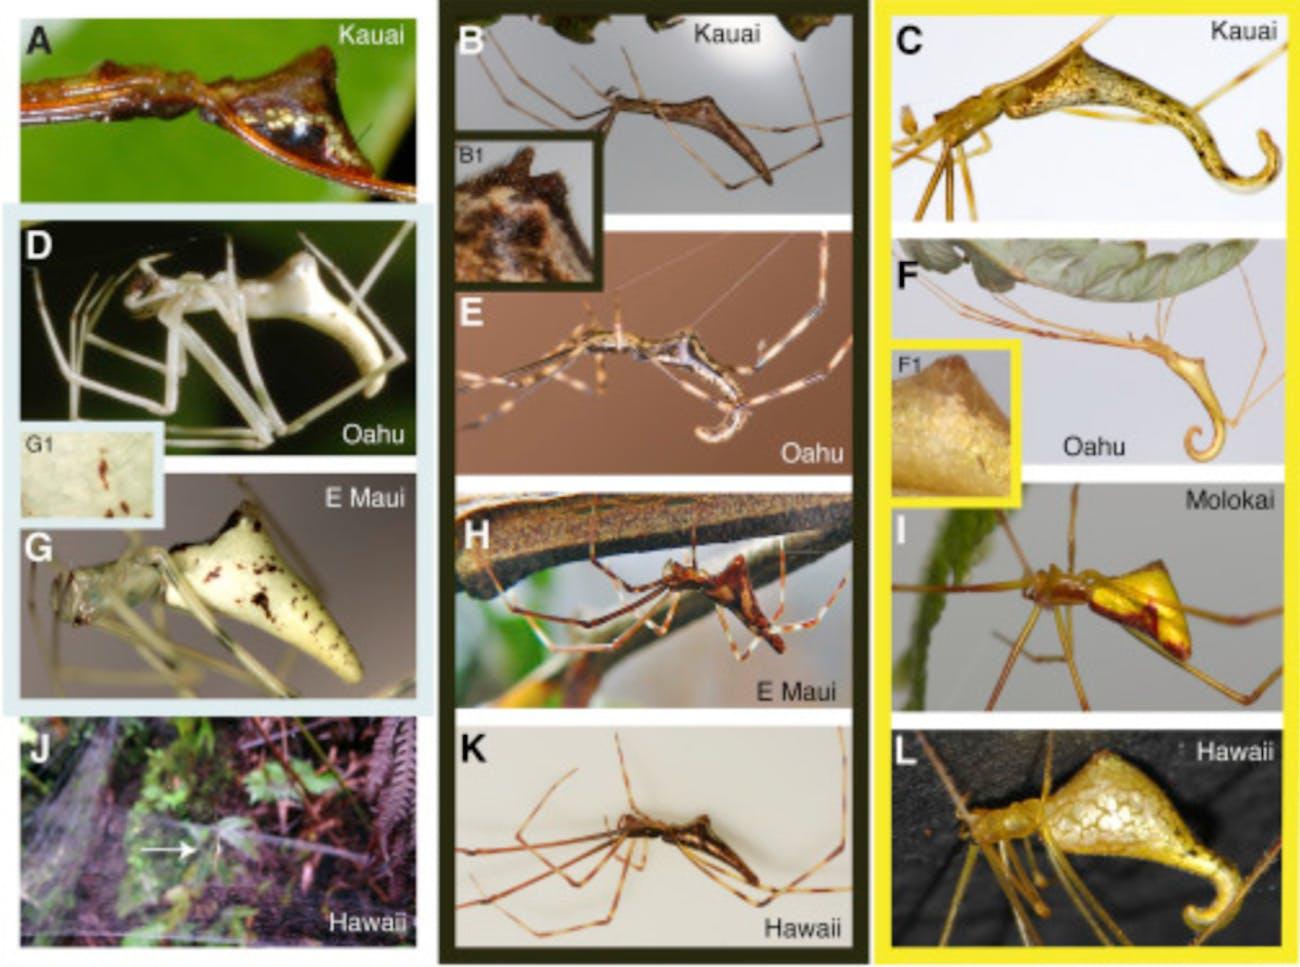 Spiders, evolution